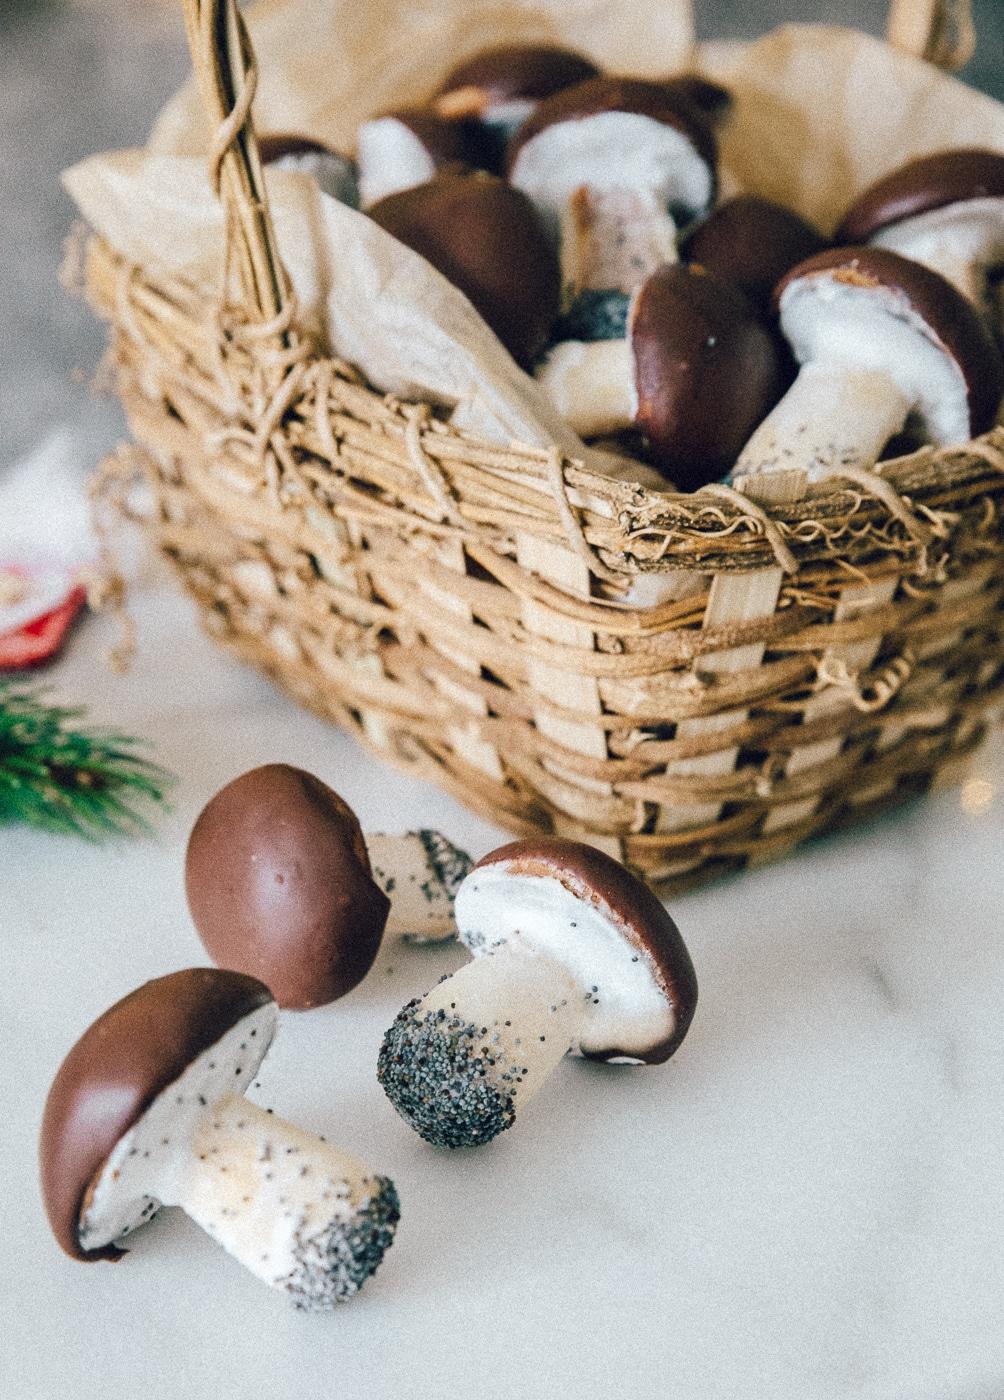 hygge svampe småkager, champignon cookies, familie, familie, hjemmebagt